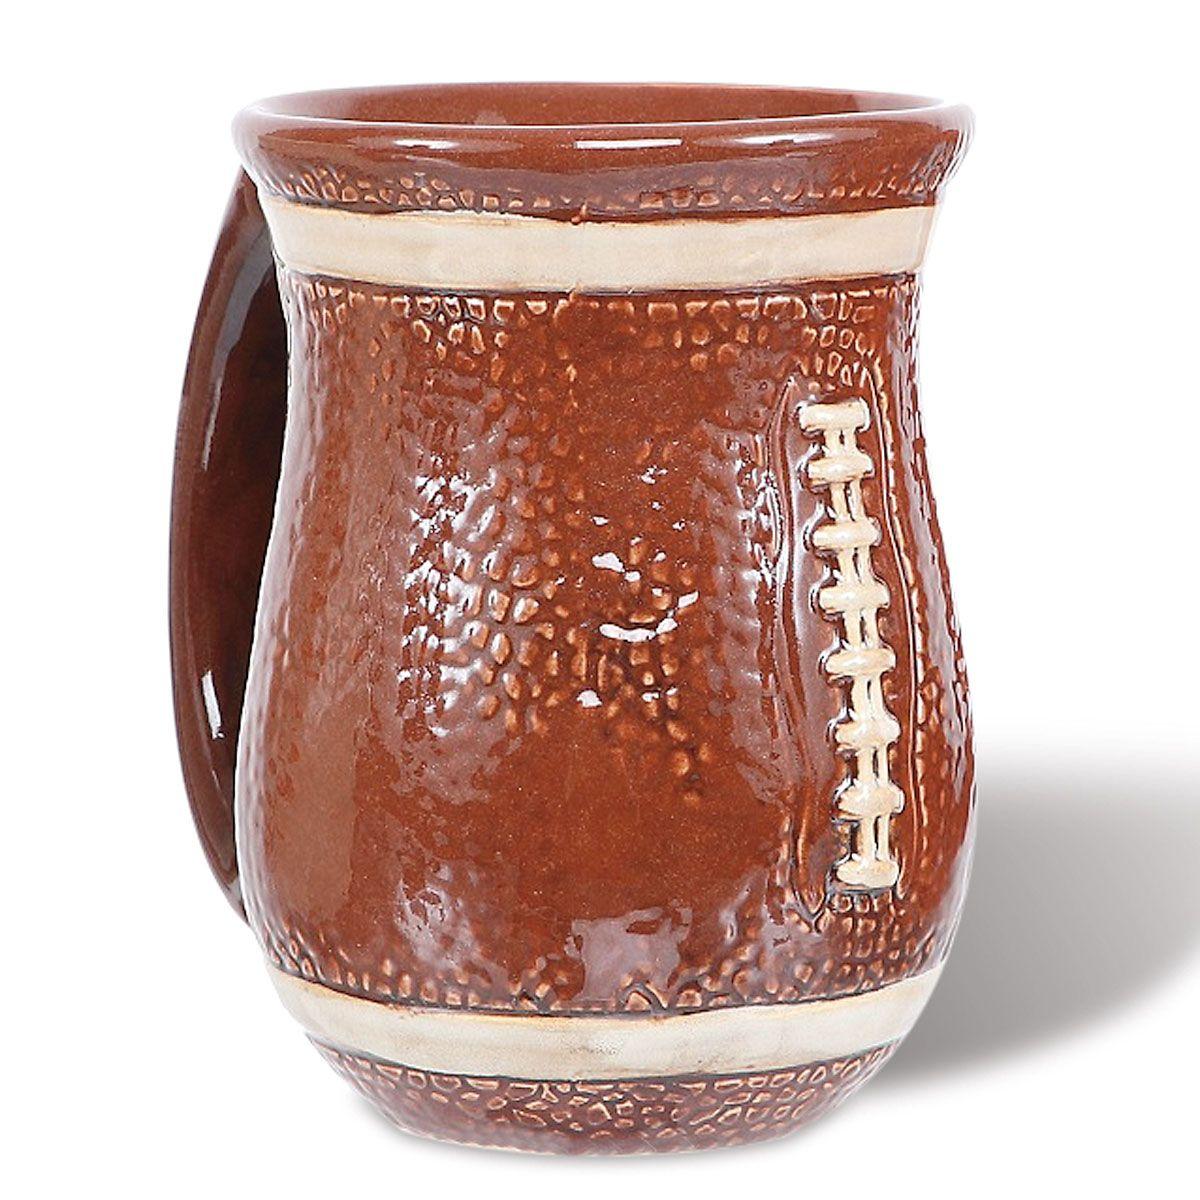 Sports Cozy Hand Mug - Football